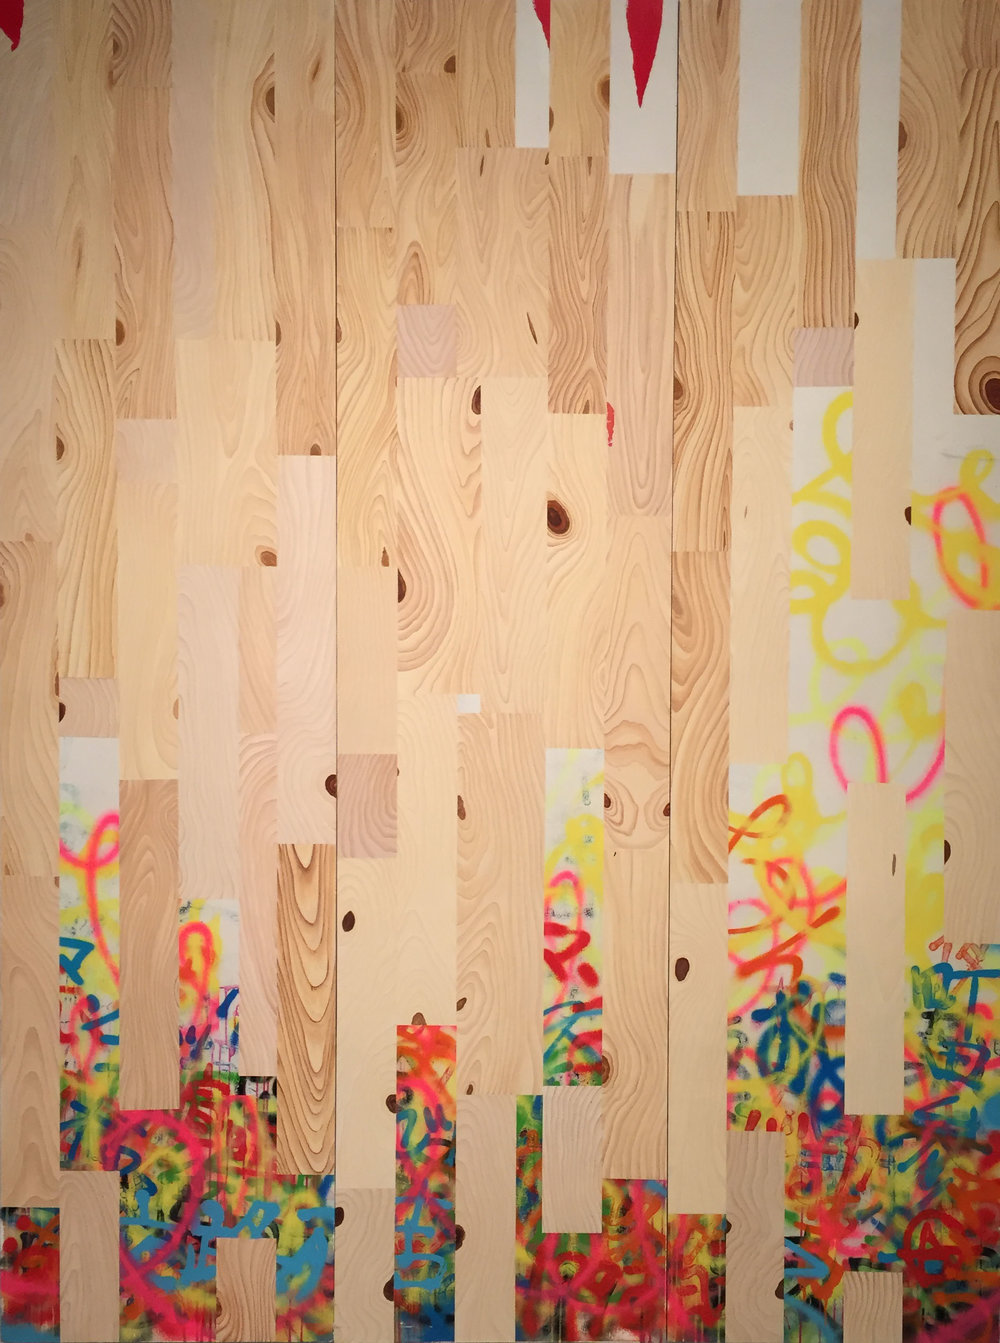 Sush Machida Gaikotsu, Not!, acrylic on wood panel, 96″ x 24″ 2016. (Photo Wendy Kveck)